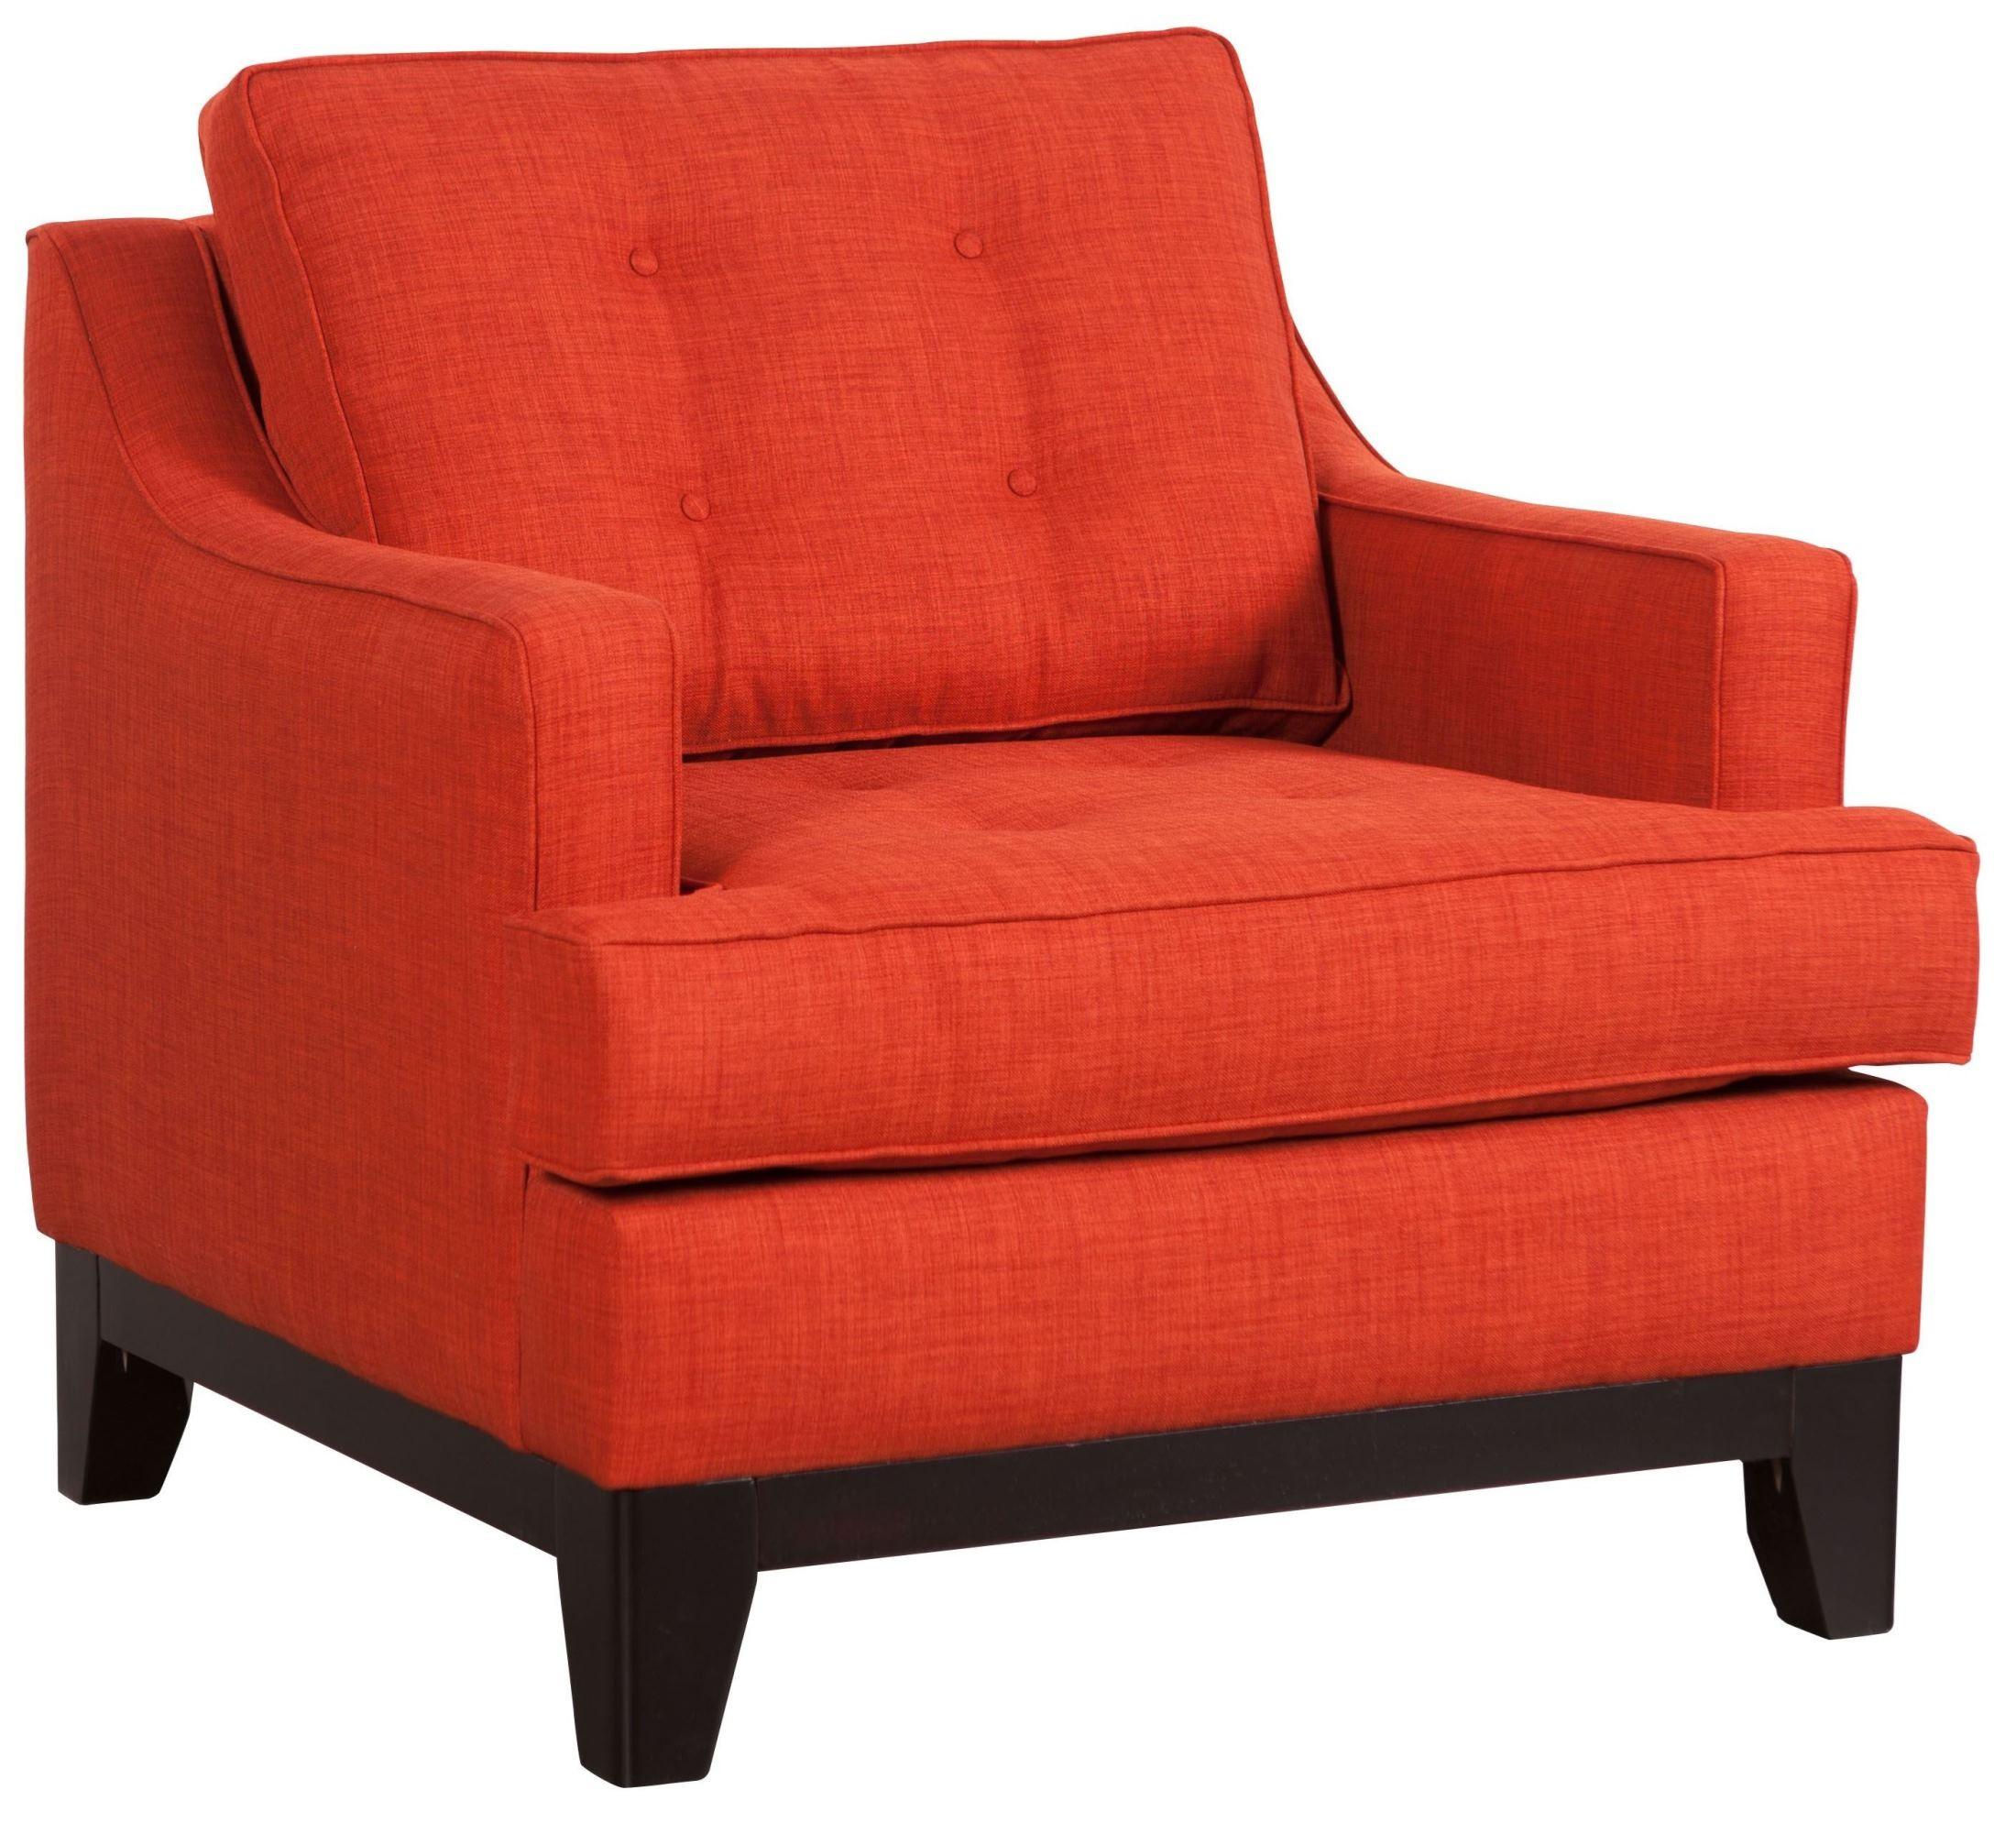 Chicago Burnt Orange Charcoal Living Room Set From Zuo Mod 100174 Coleman Furniture